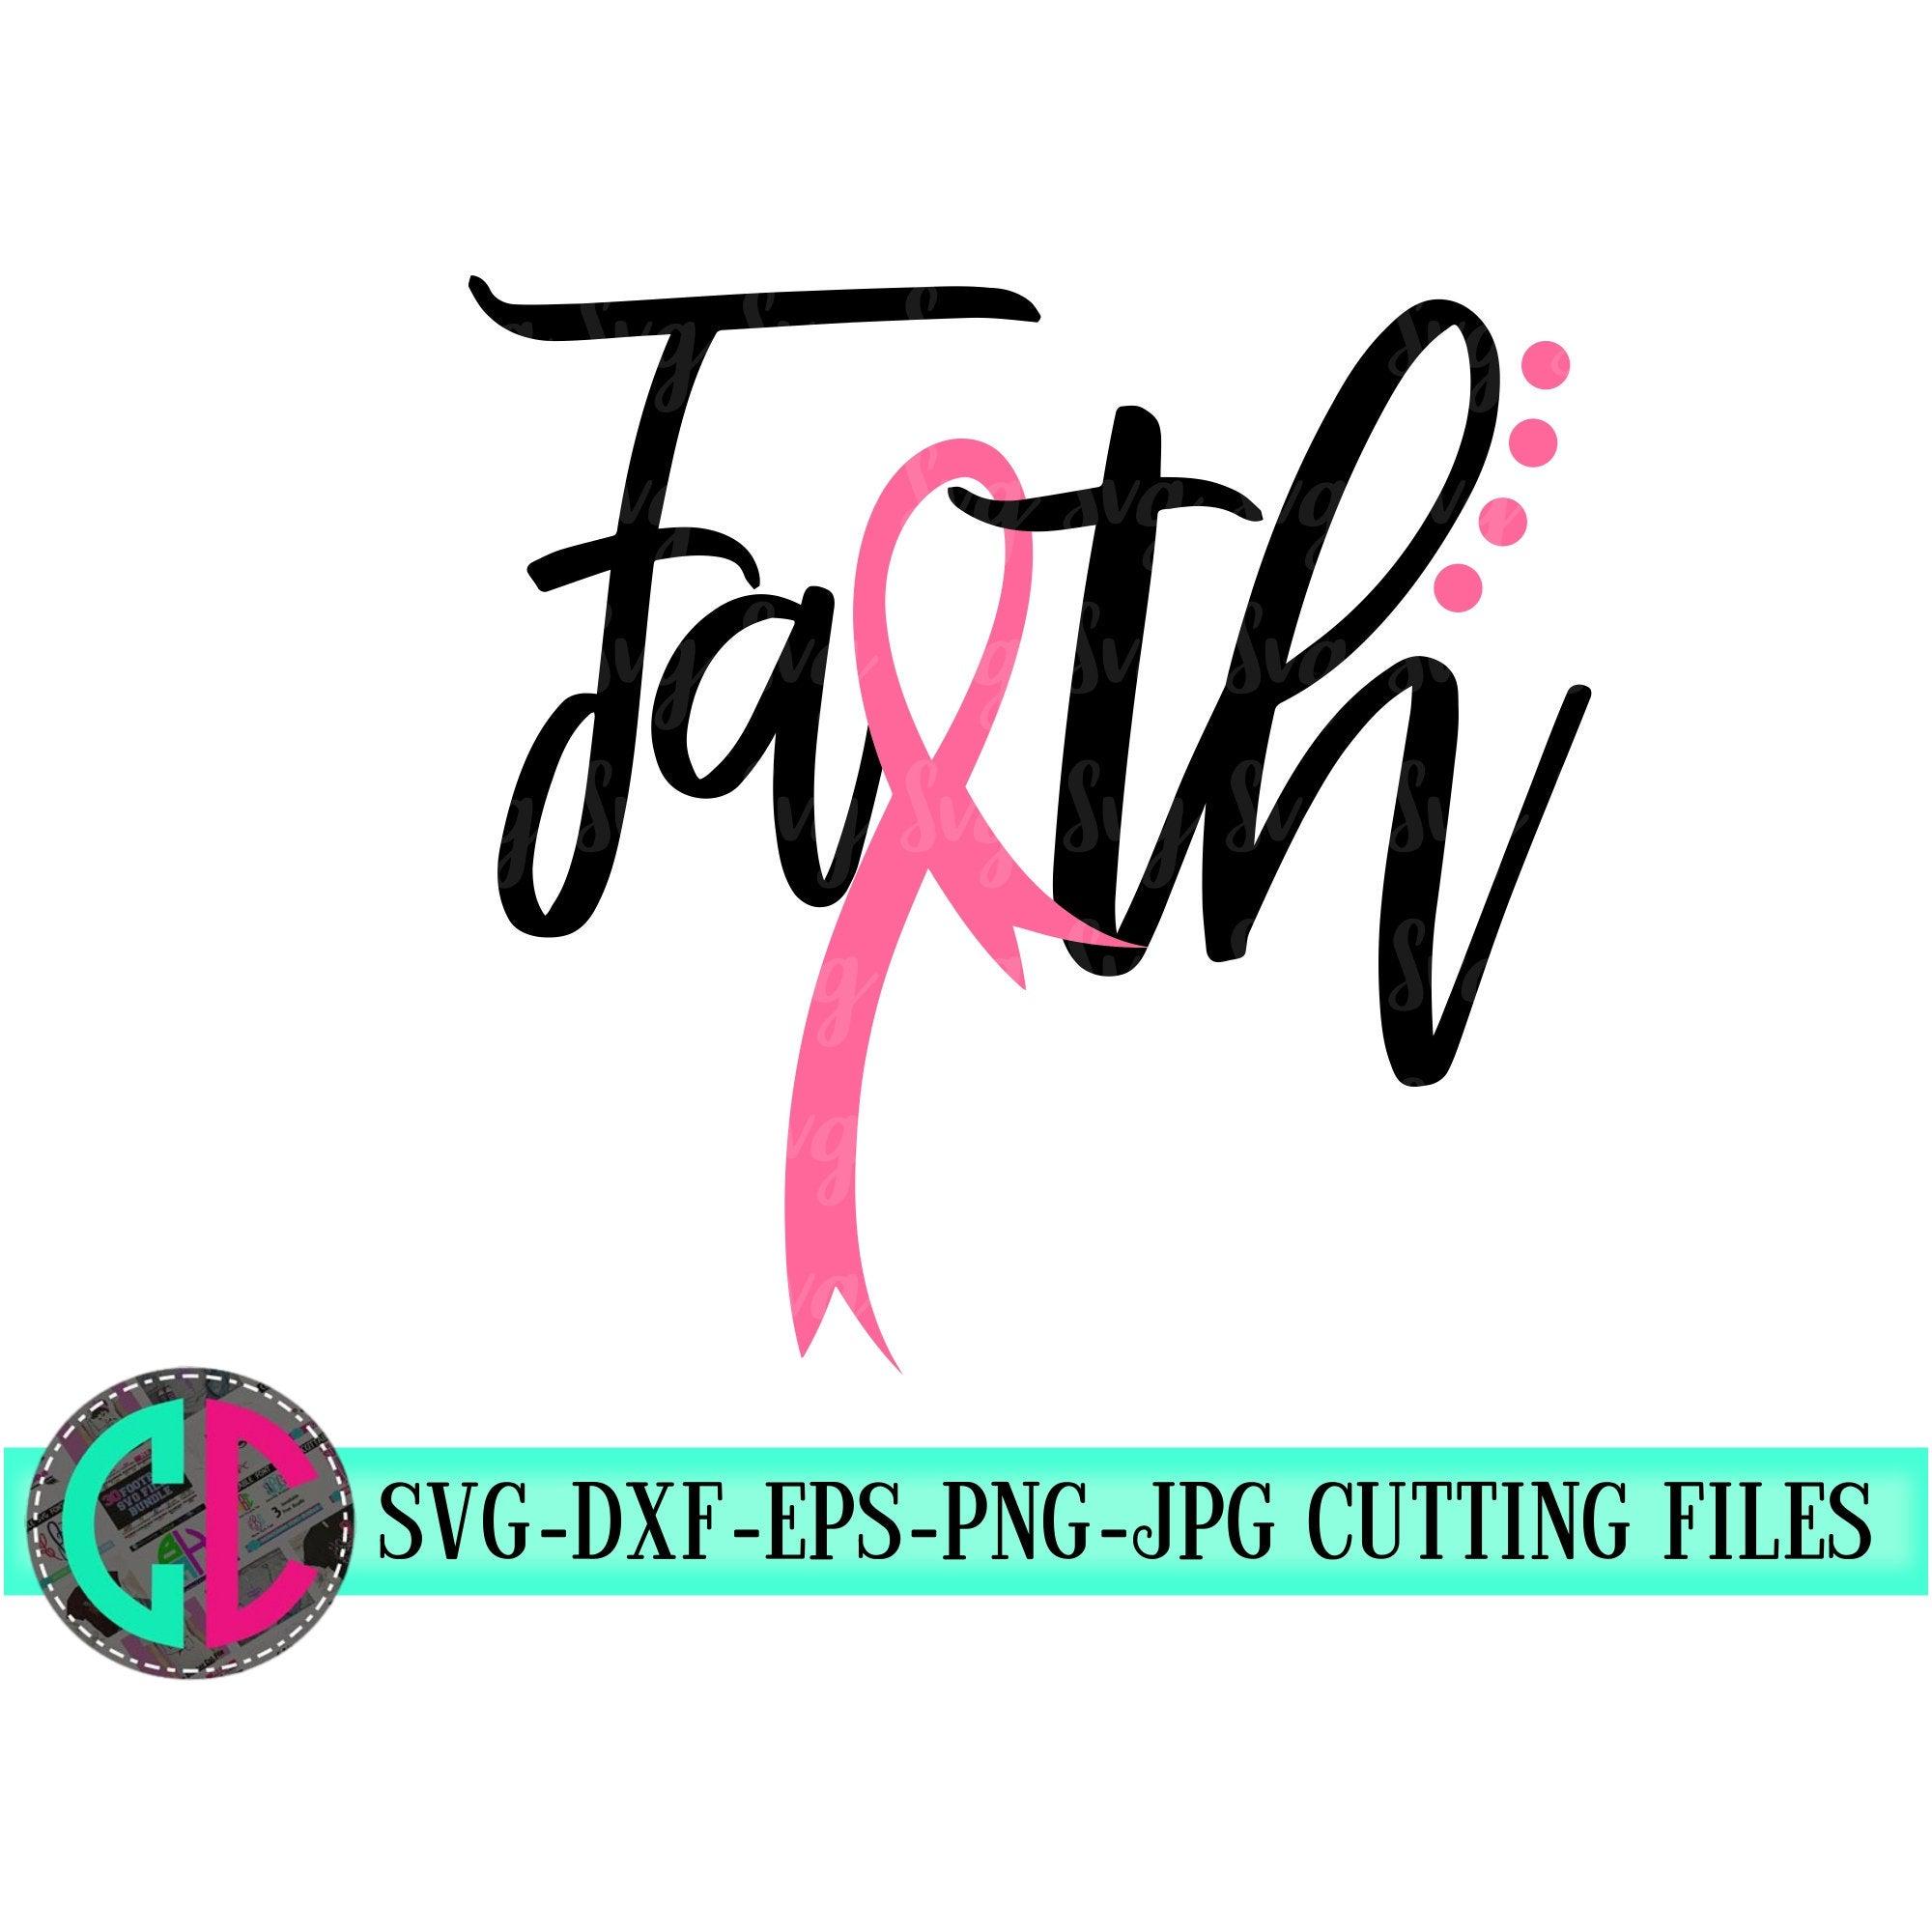 Faith-ribbon-svgbreast-cancer-svgcancer-survivor-svgpinkrelay-for-life-svgbreast-cancersilhouettetshirt-svgcameosvg-for-cricut-5e2203e9